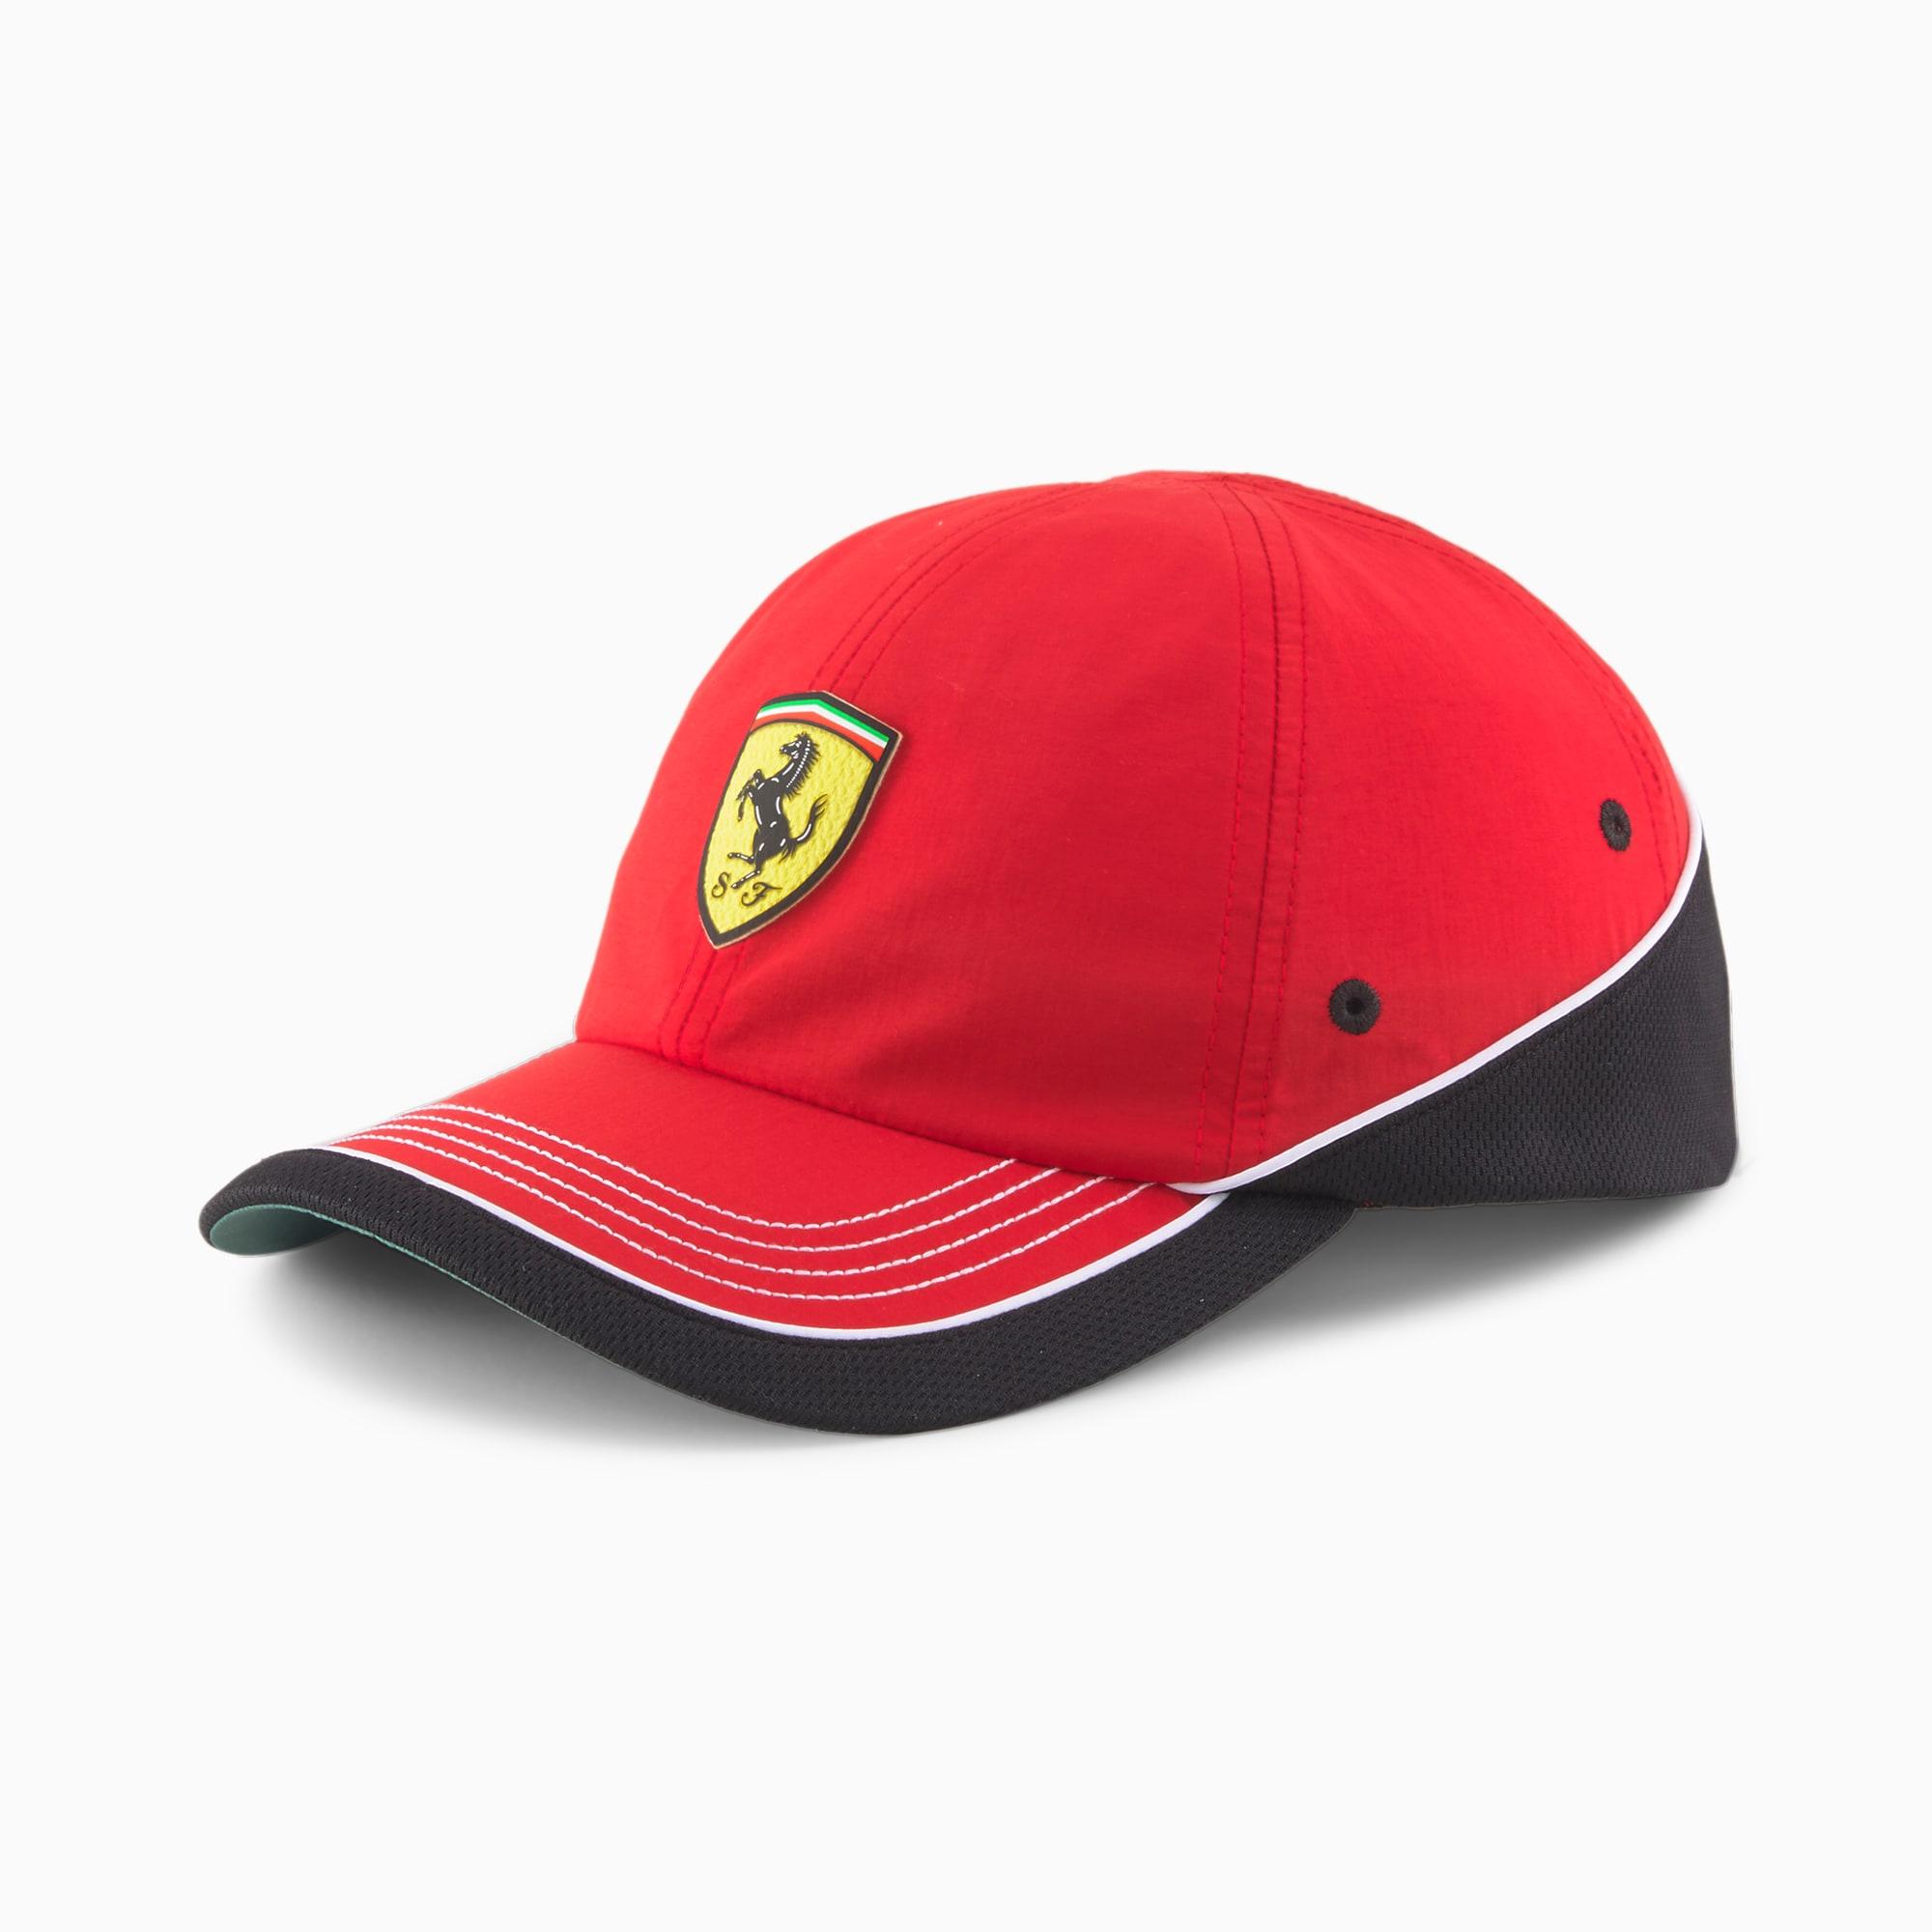 Scuderia Ferrari Baseball Cap Rosso Corsa Puma Mens Styles Puma Germany